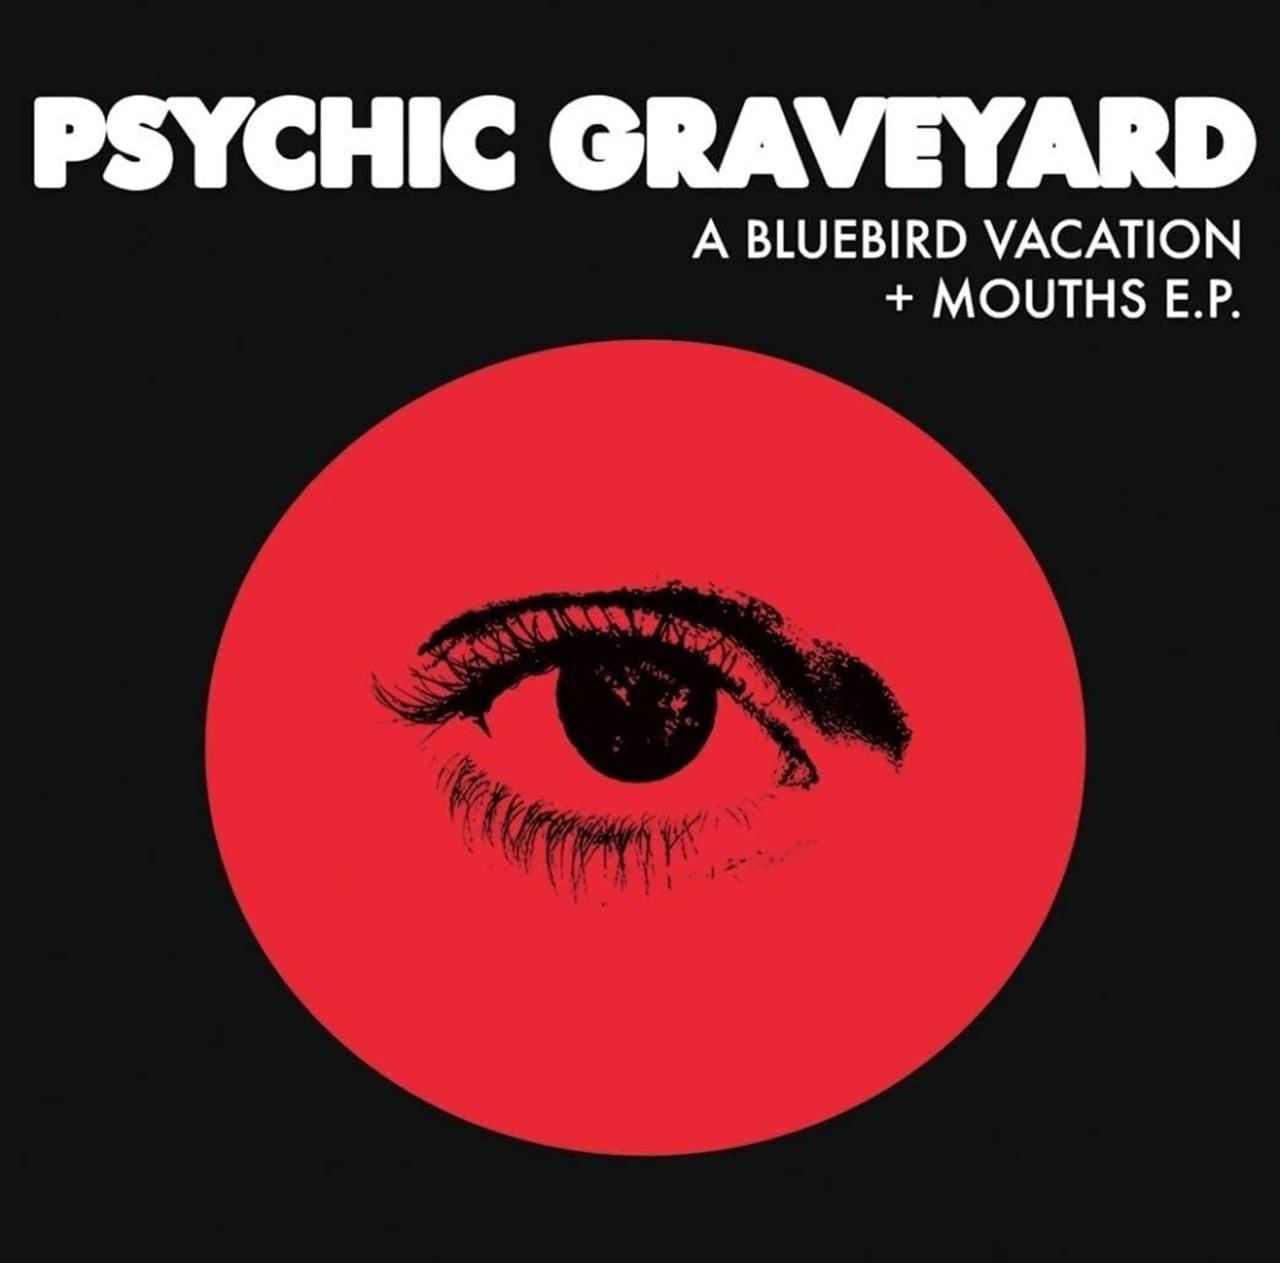 A Bluebird Vacation/Mouths E.P. - 1